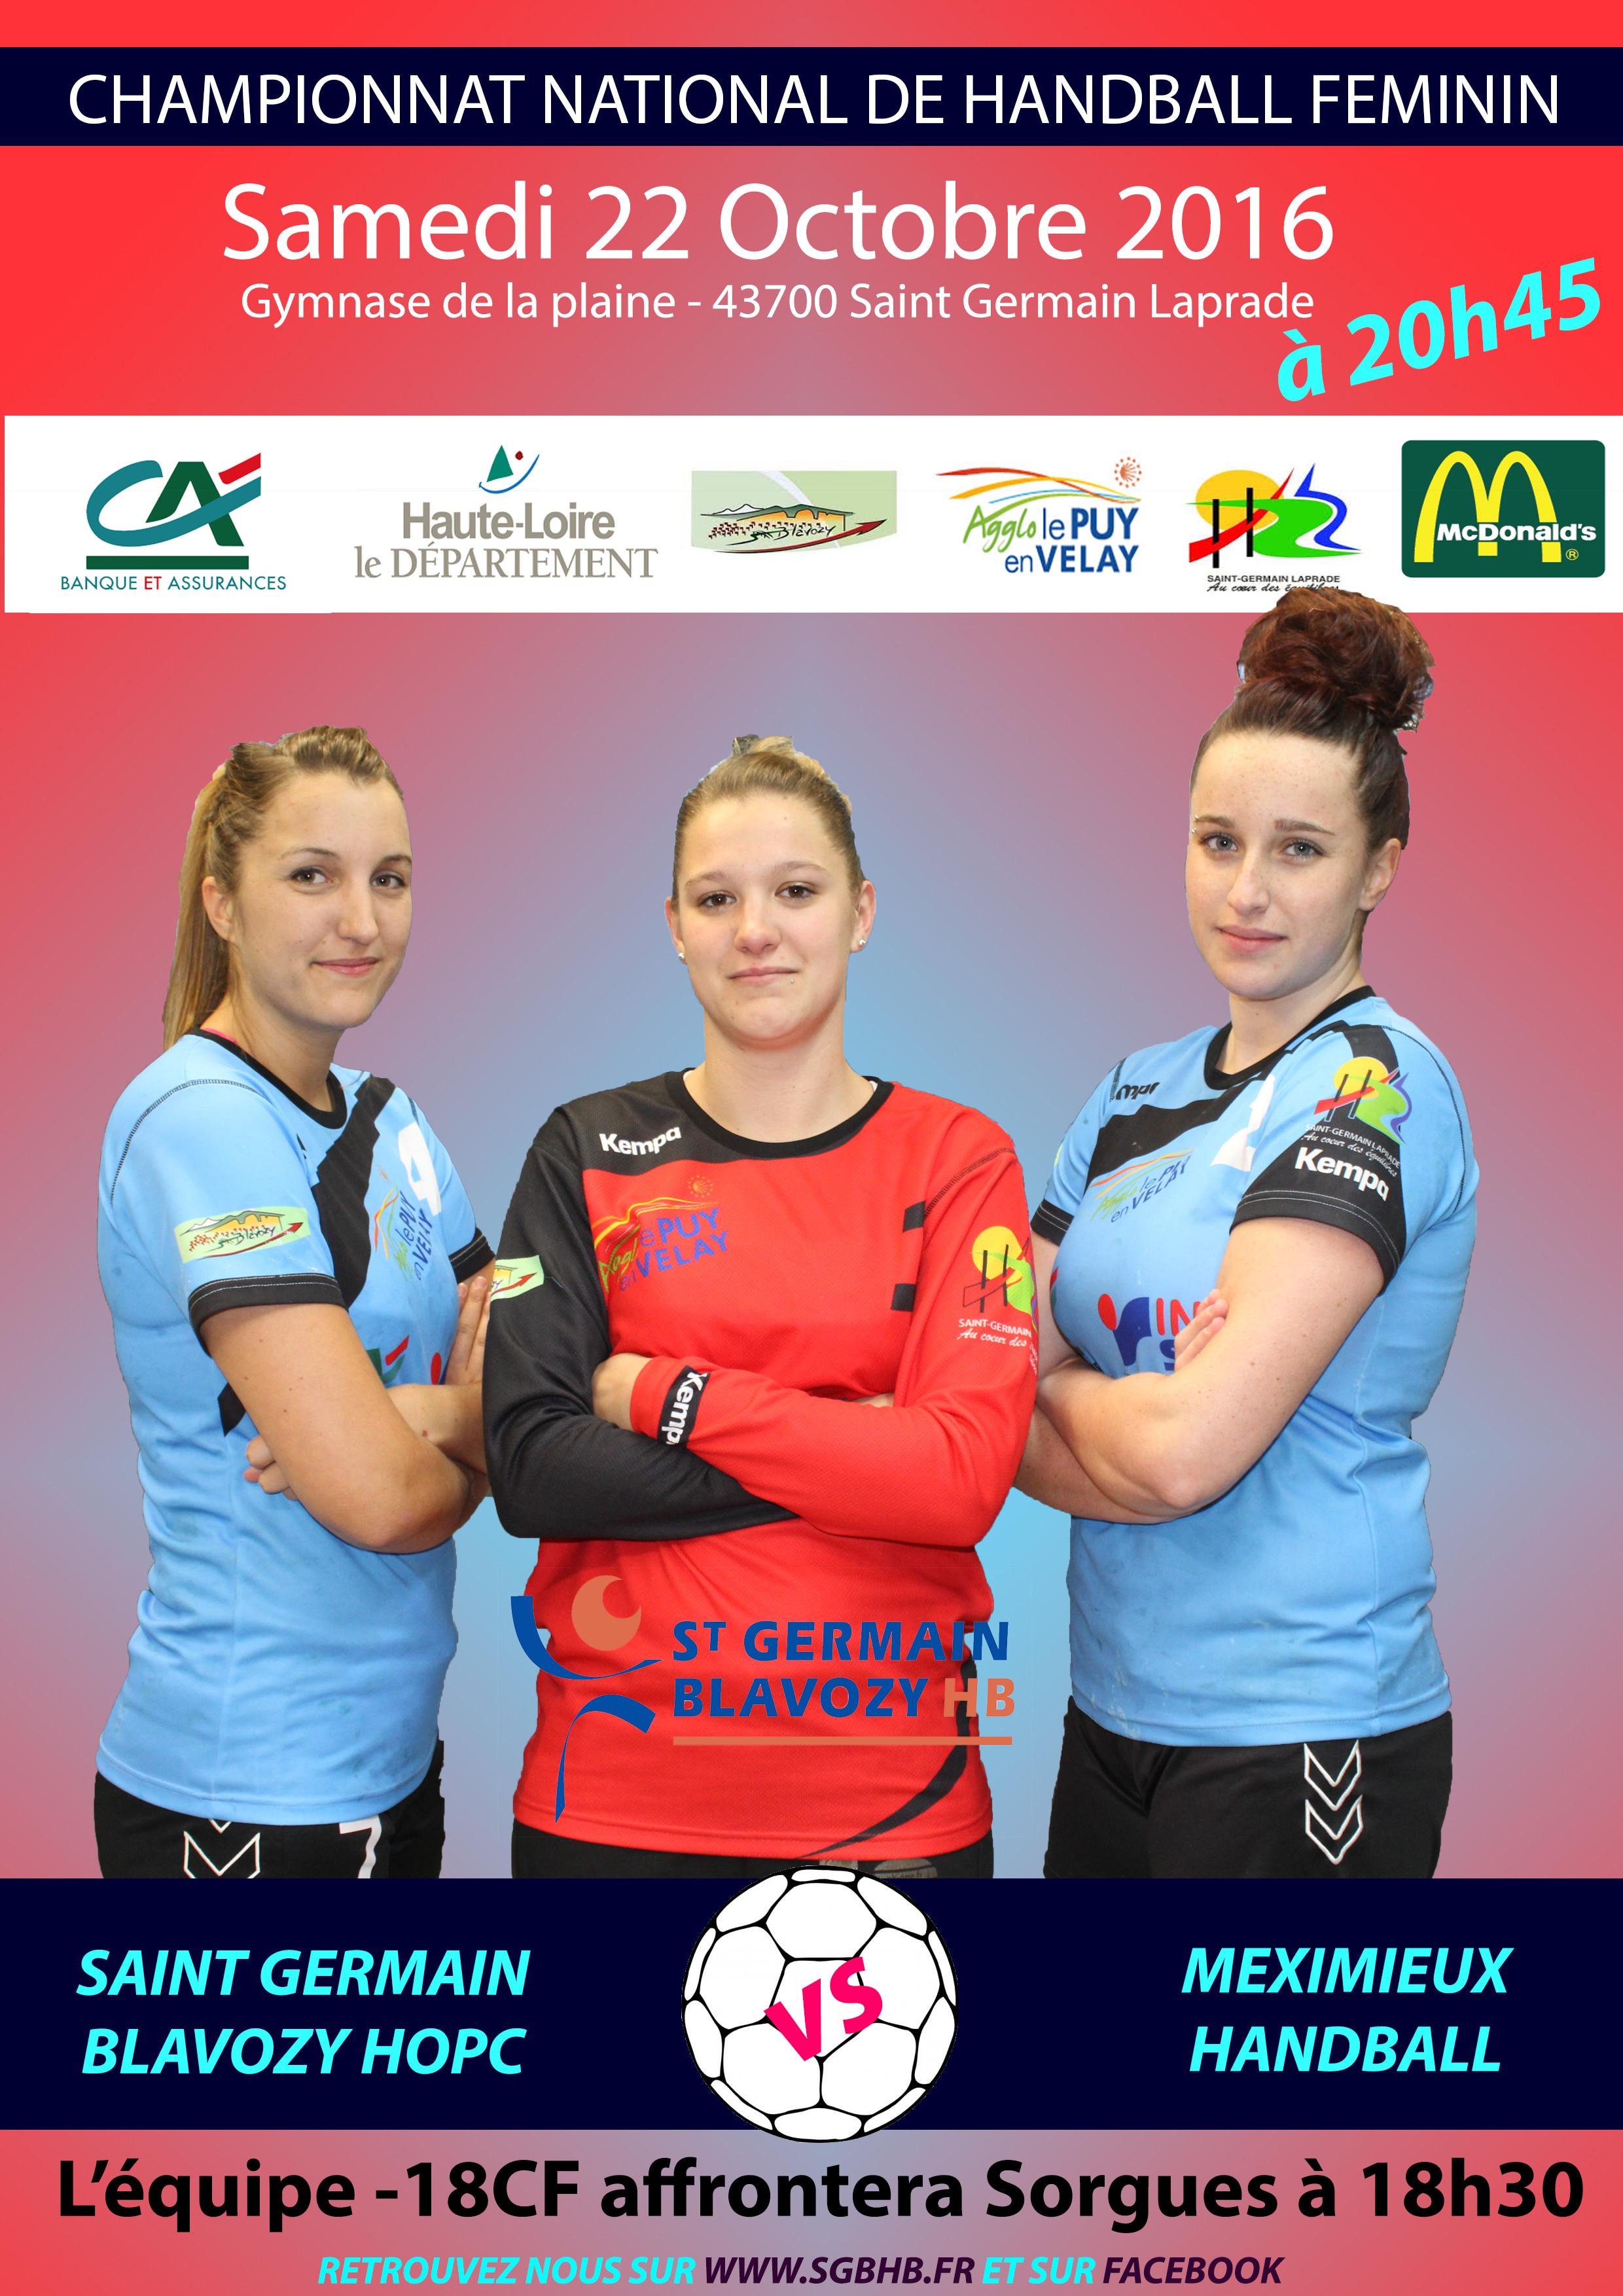 HAND BALL NATIONALE 3 FEMININE ST GERMAIN BLAVOZY HOPC-MEXIMIEUX 21/10/16 20H45